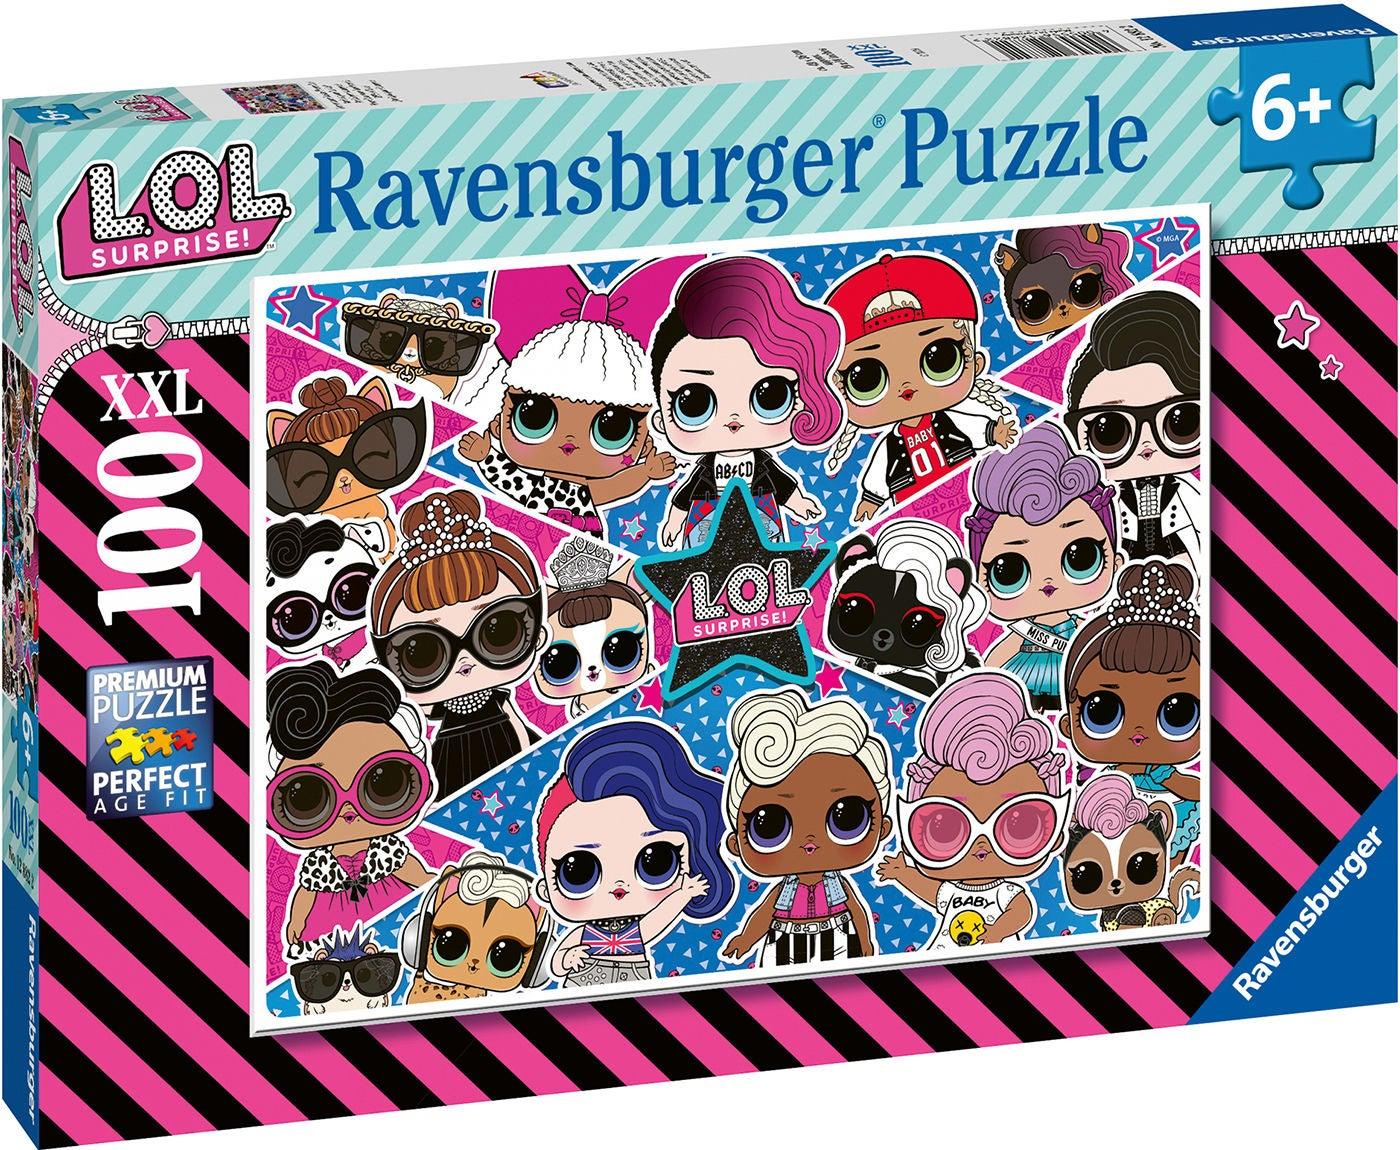 Ravensburger Pussel L.O.L. Surprise! XXL 100 Bitar